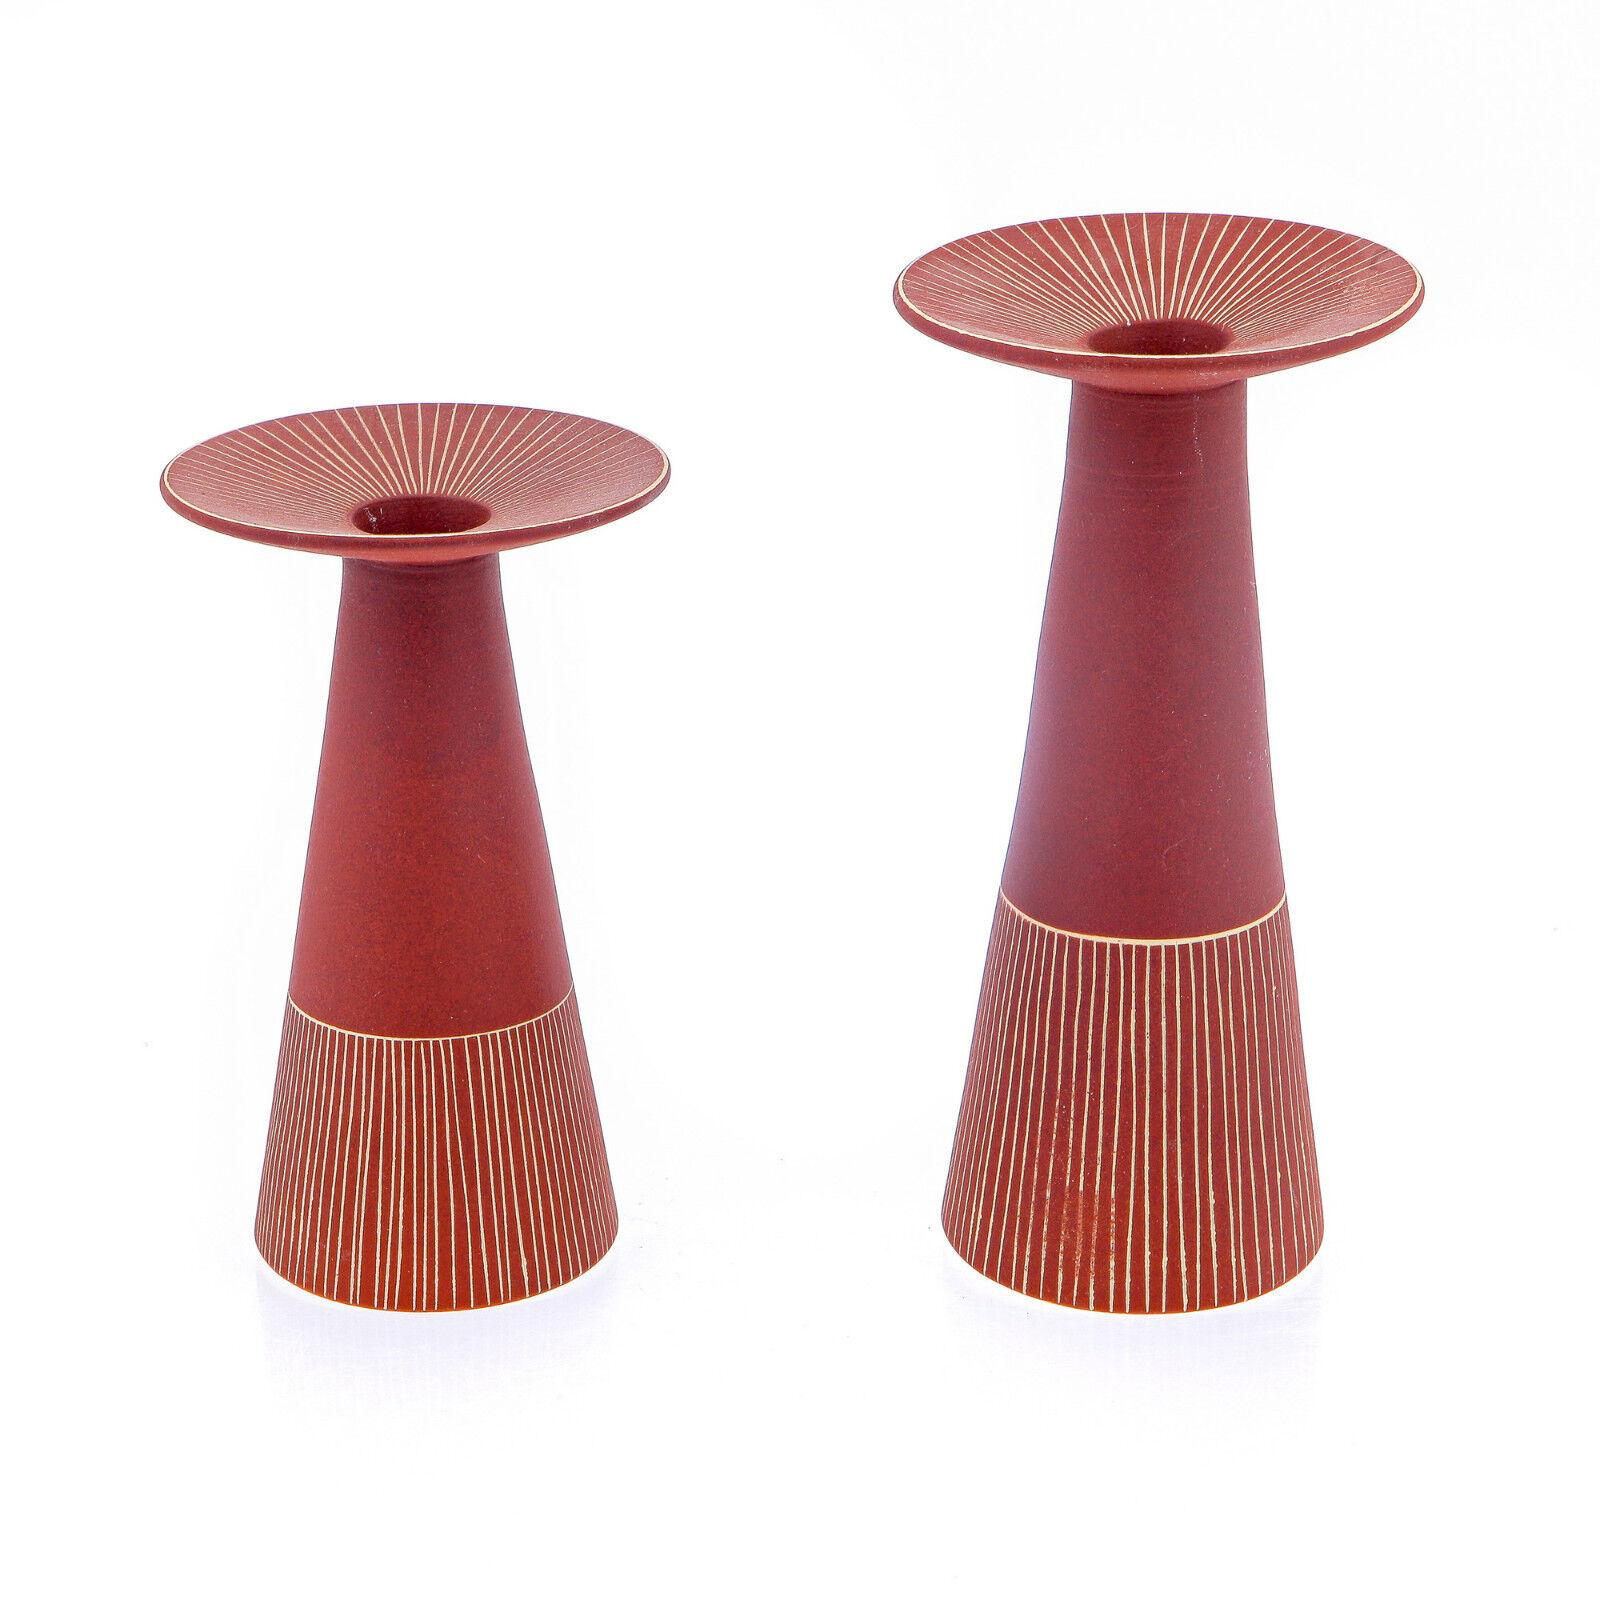 Pillar Candle Holder Pair - Handmade Modern Ceramic Candle Holders Set - rot